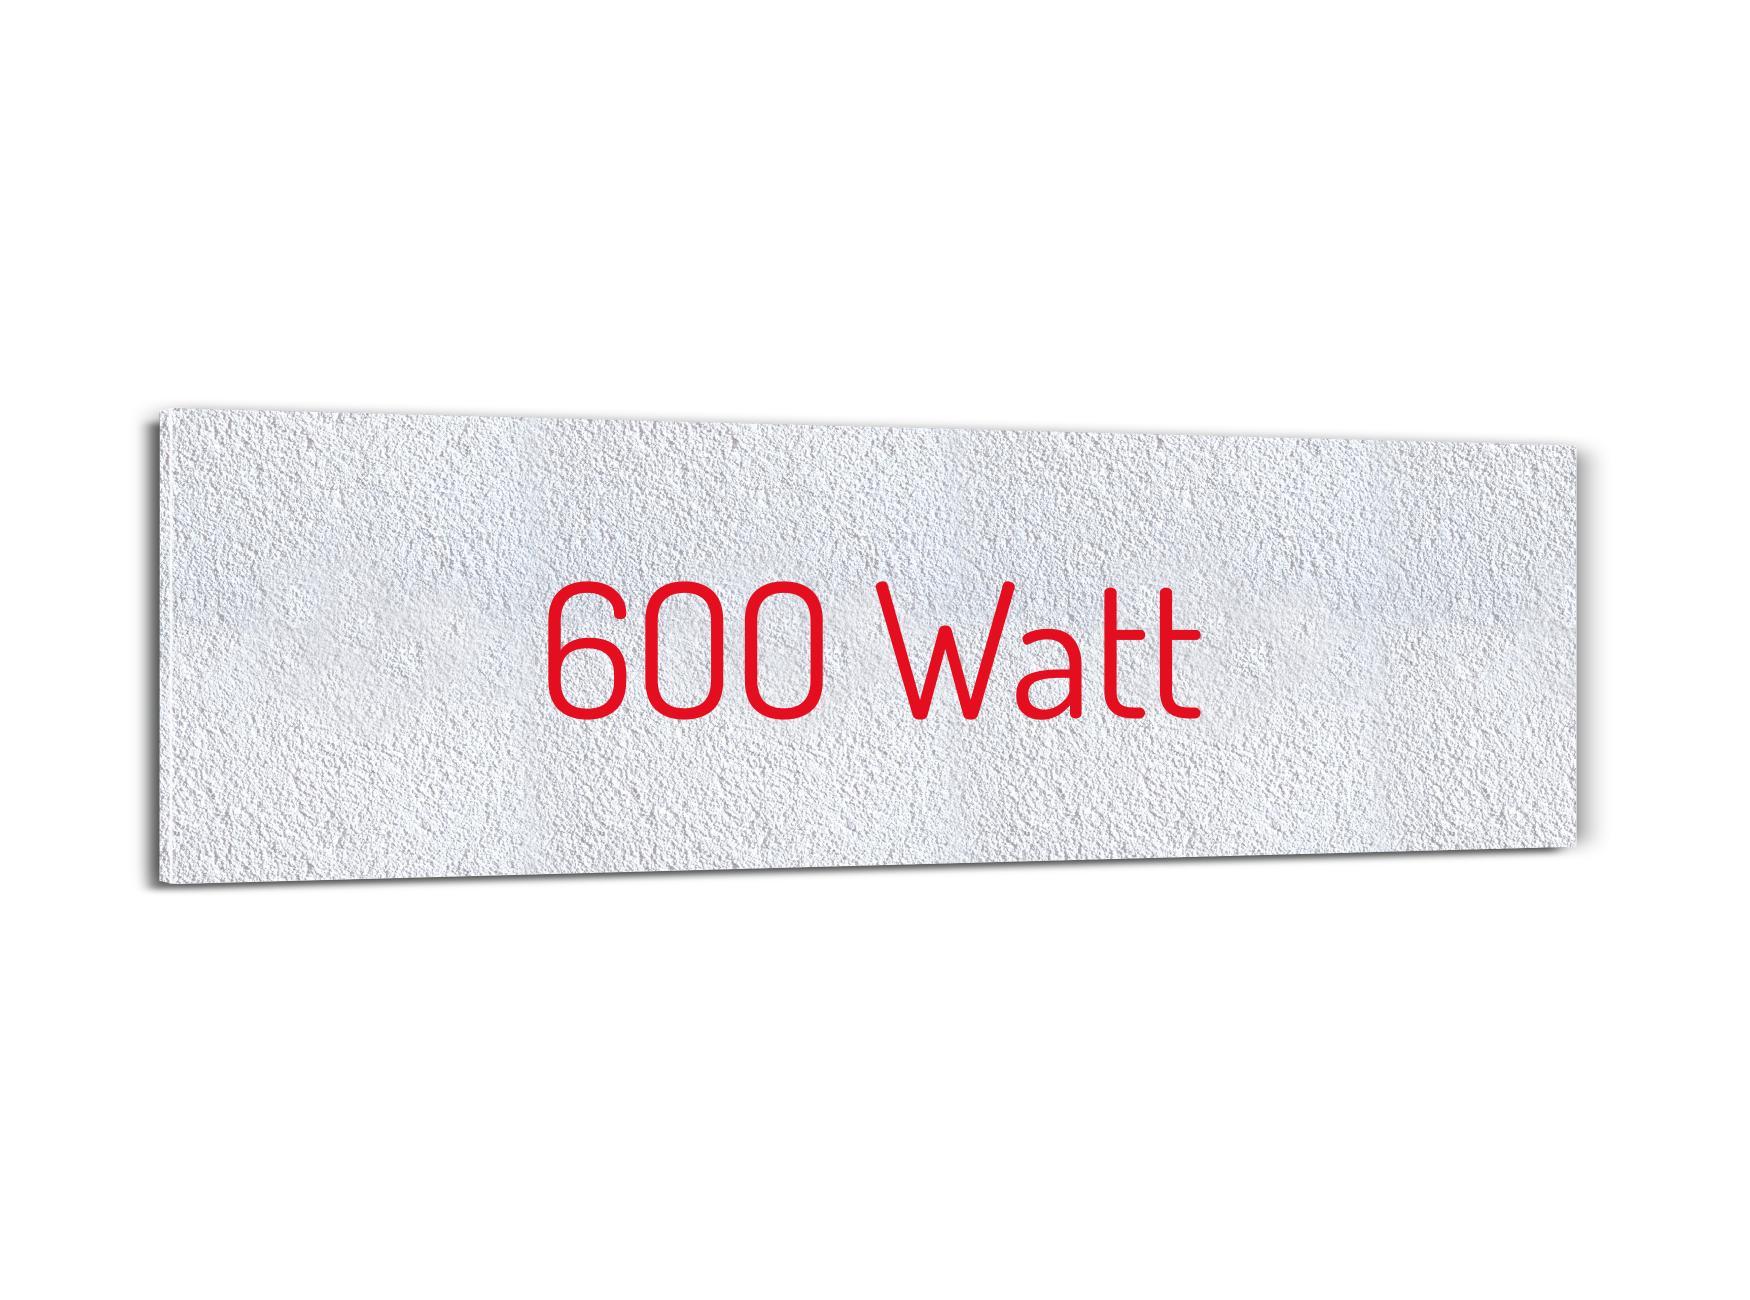 PowerSun Reflex 600 Watt 40x120cm